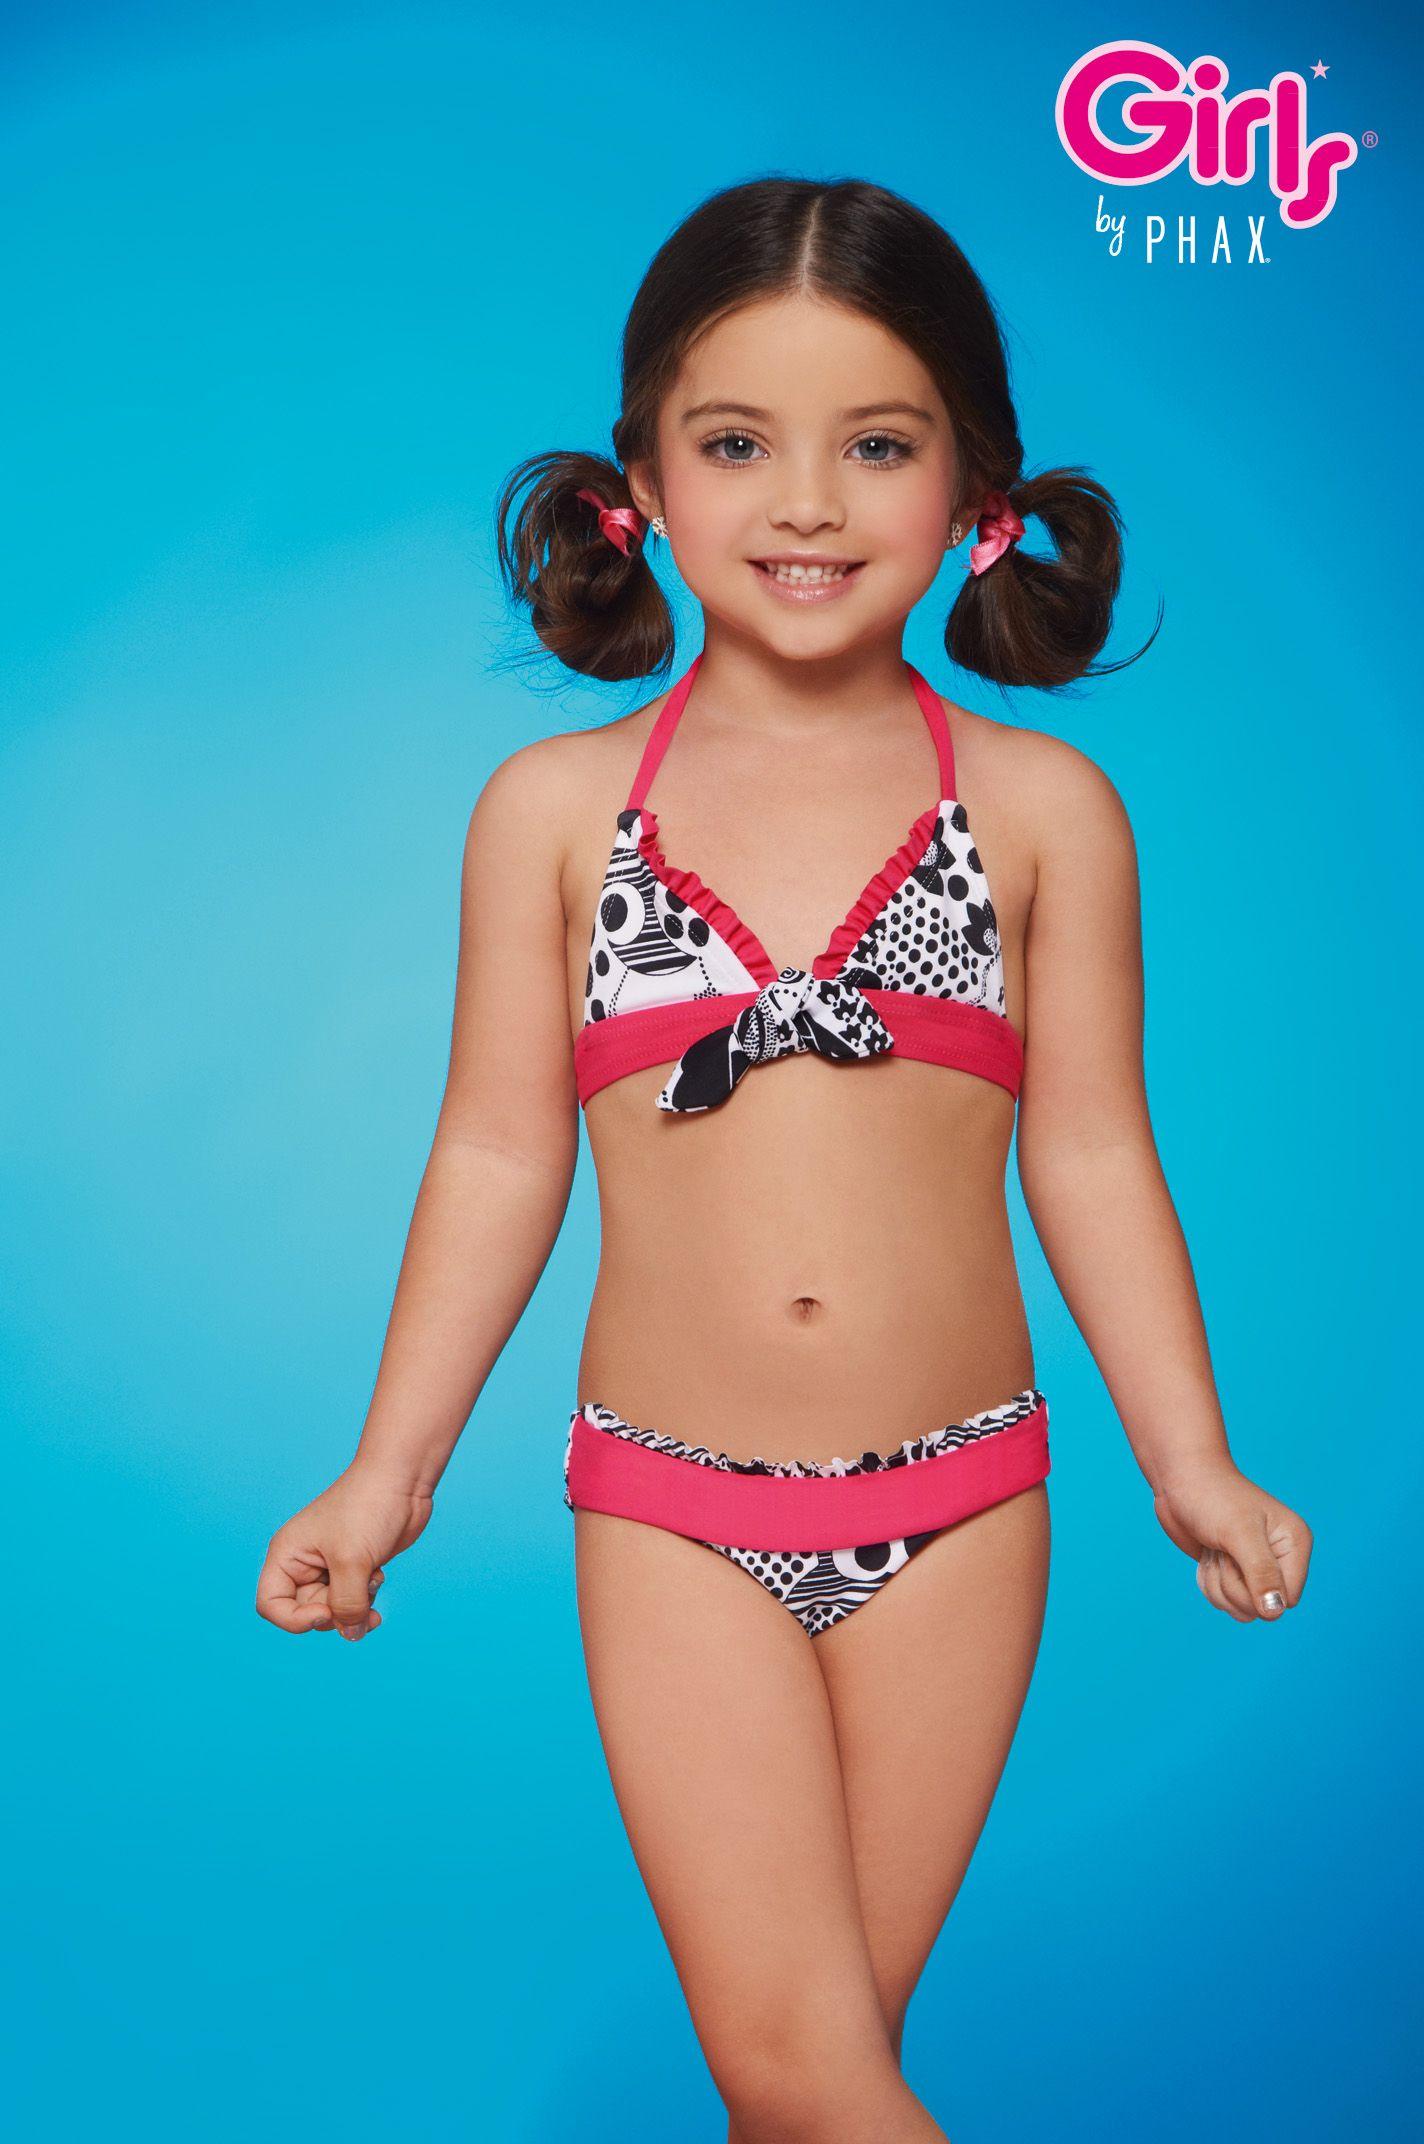 Bikini Girls By Phax Girls By Phax Pinterest